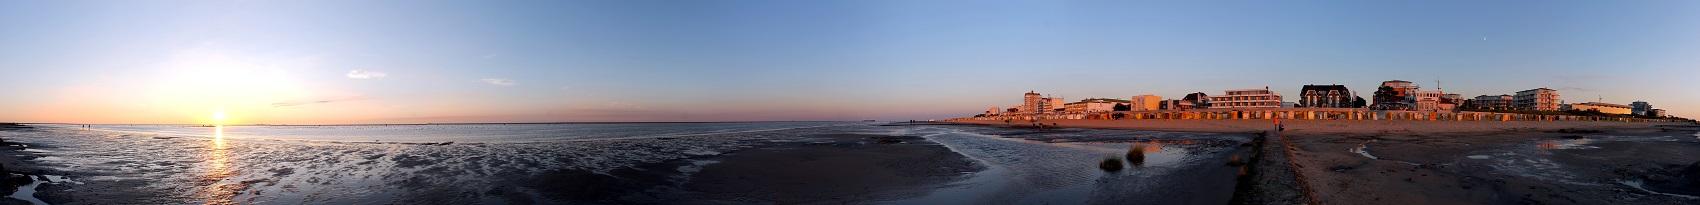 Cuxhaven-Duhnen Strandpanorama